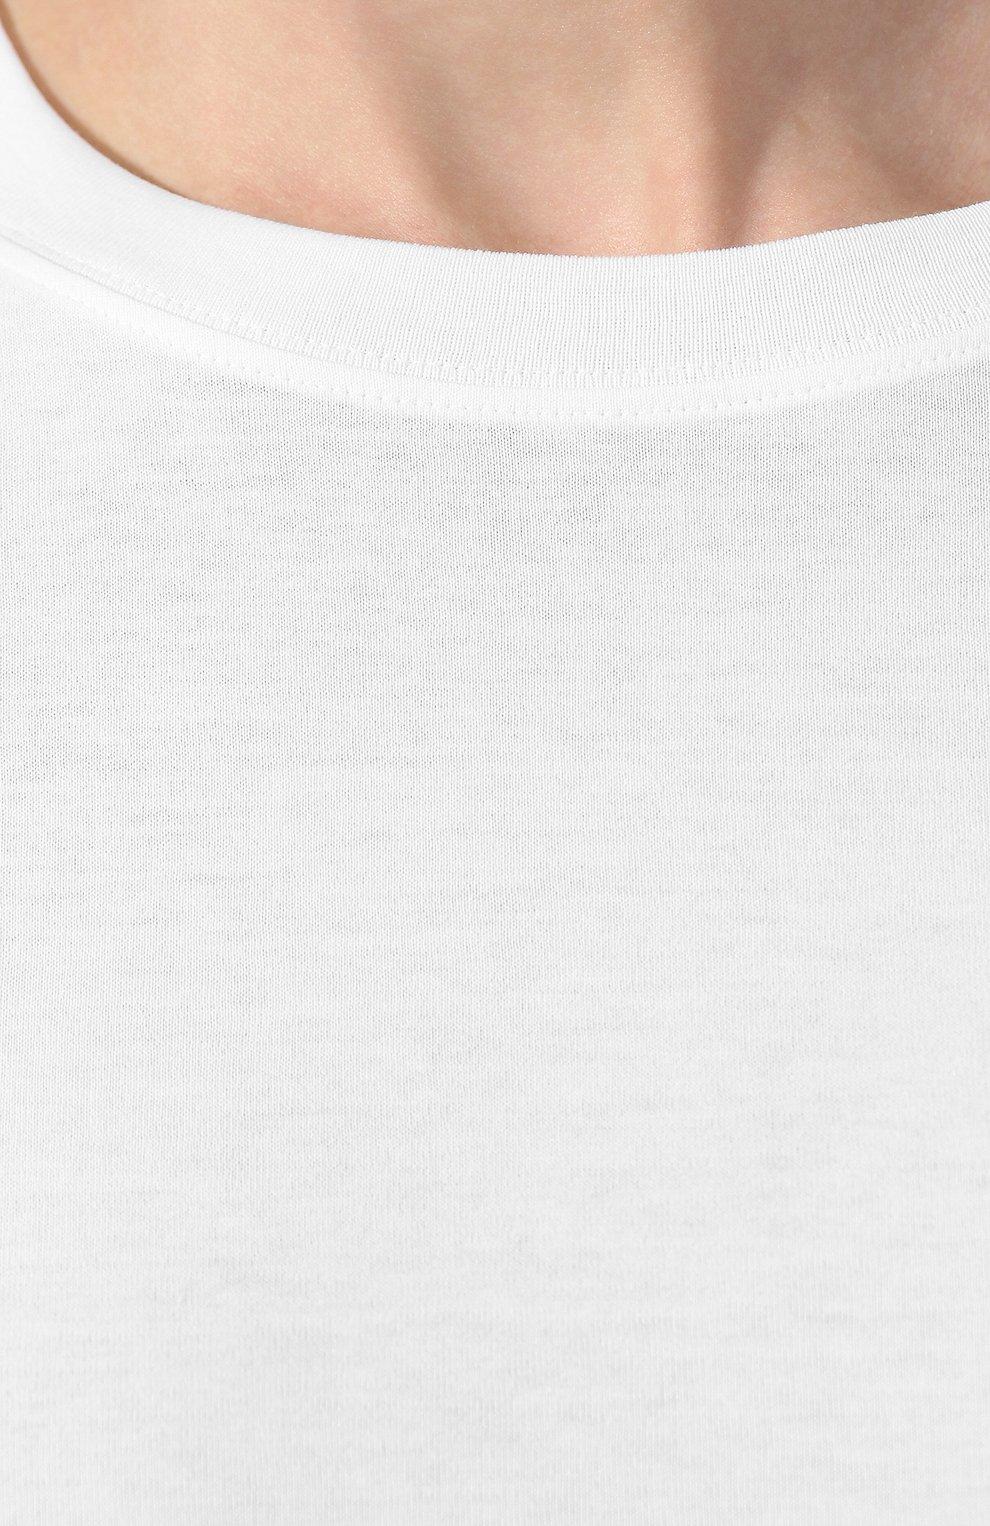 Мужская хлопковая футболка BOTTEGA VENETA белого цвета, арт. 575589/VKAB0 | Фото 5